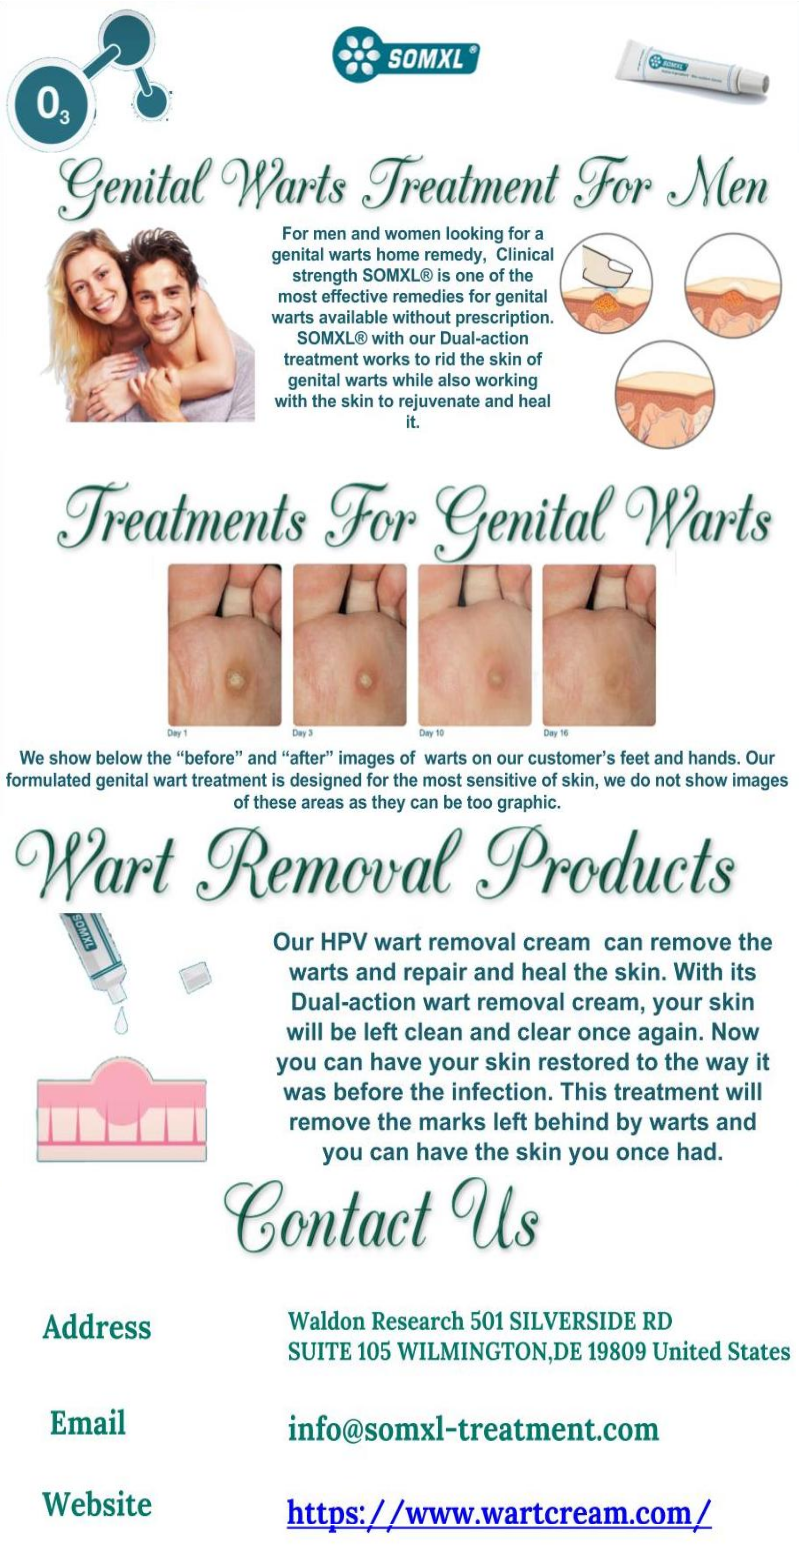 Genital warts removal cream. Hpv warts treatment cream